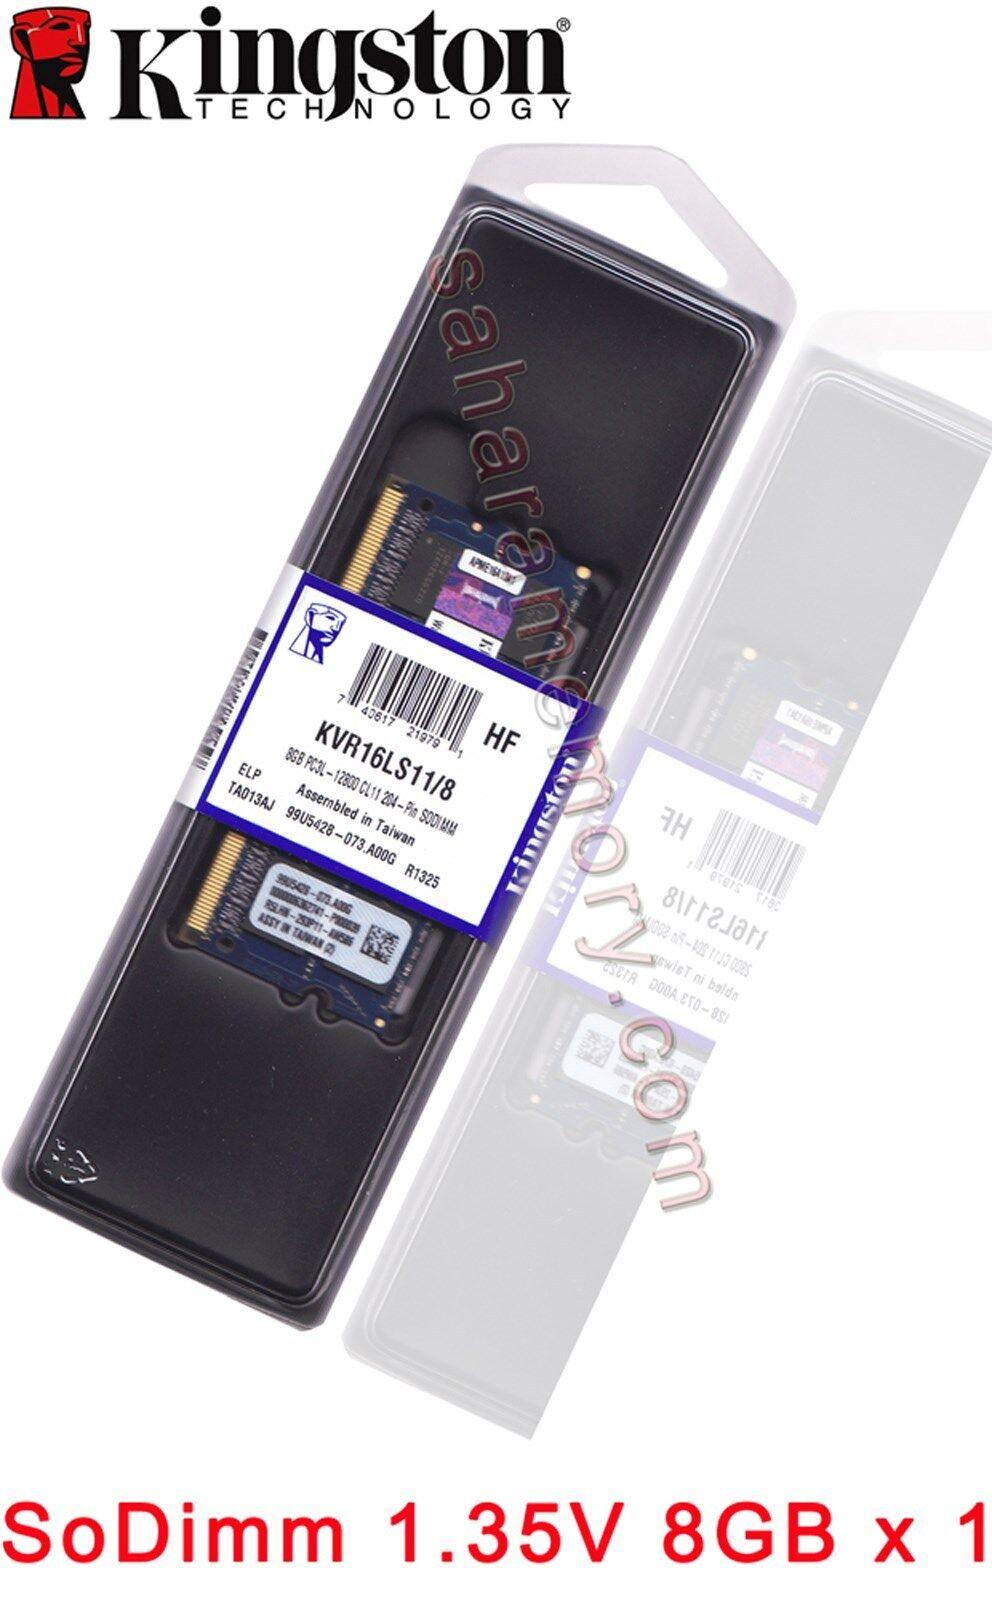 Kingston Technology 8GB 1600MHz DDR3L  1.35V Non-ECC CL11 SO